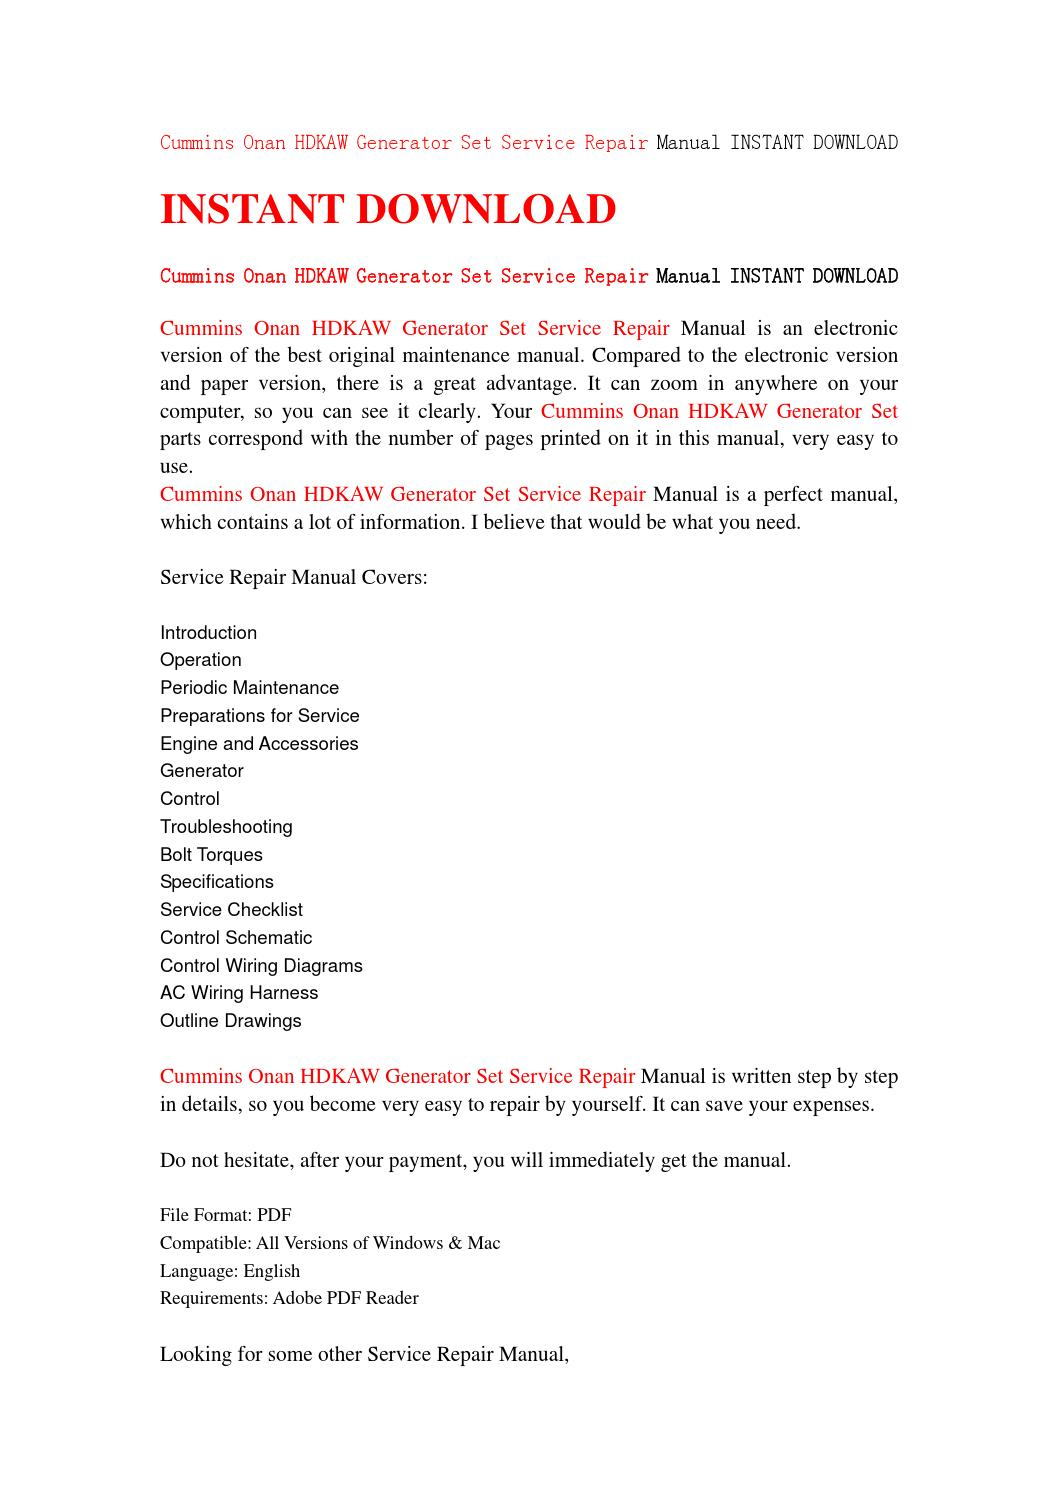 hight resolution of cummins onan hdkaw generator set service repair manual instant download by jhsefjn7 issuu